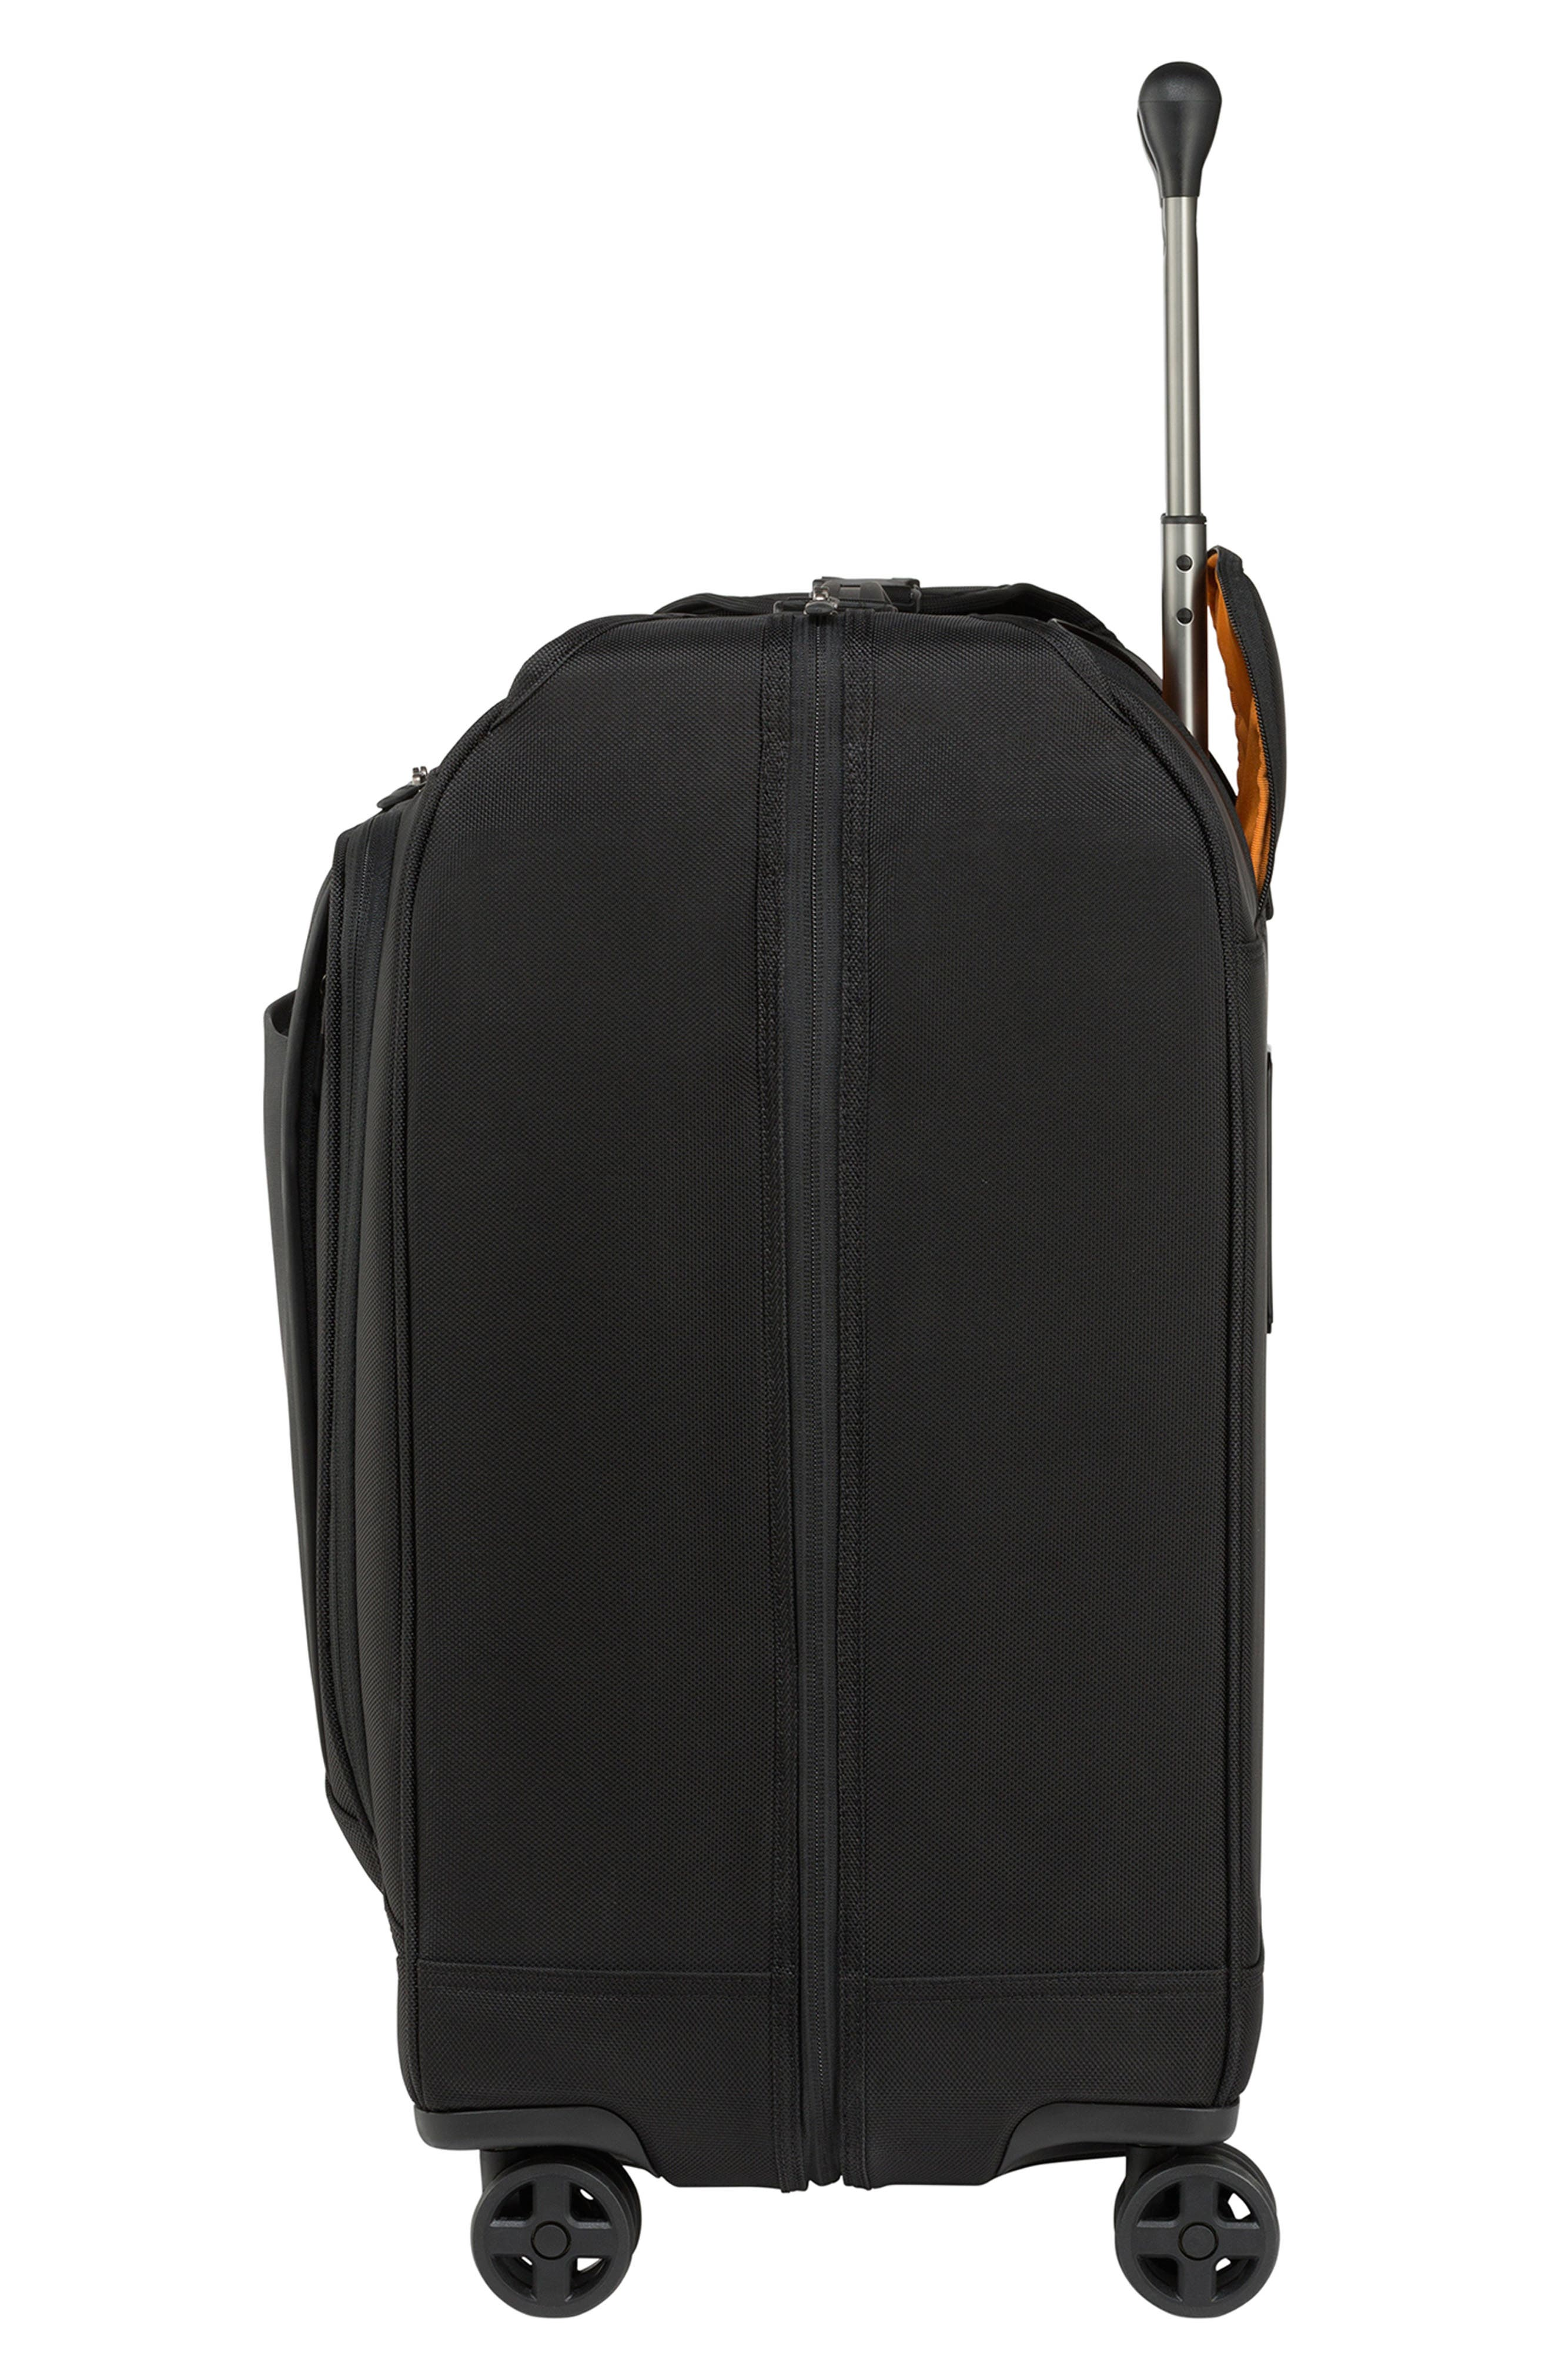 WT 5.0 Dual Caster Wheeled Garment Bag,                             Alternate thumbnail 3, color,                             001